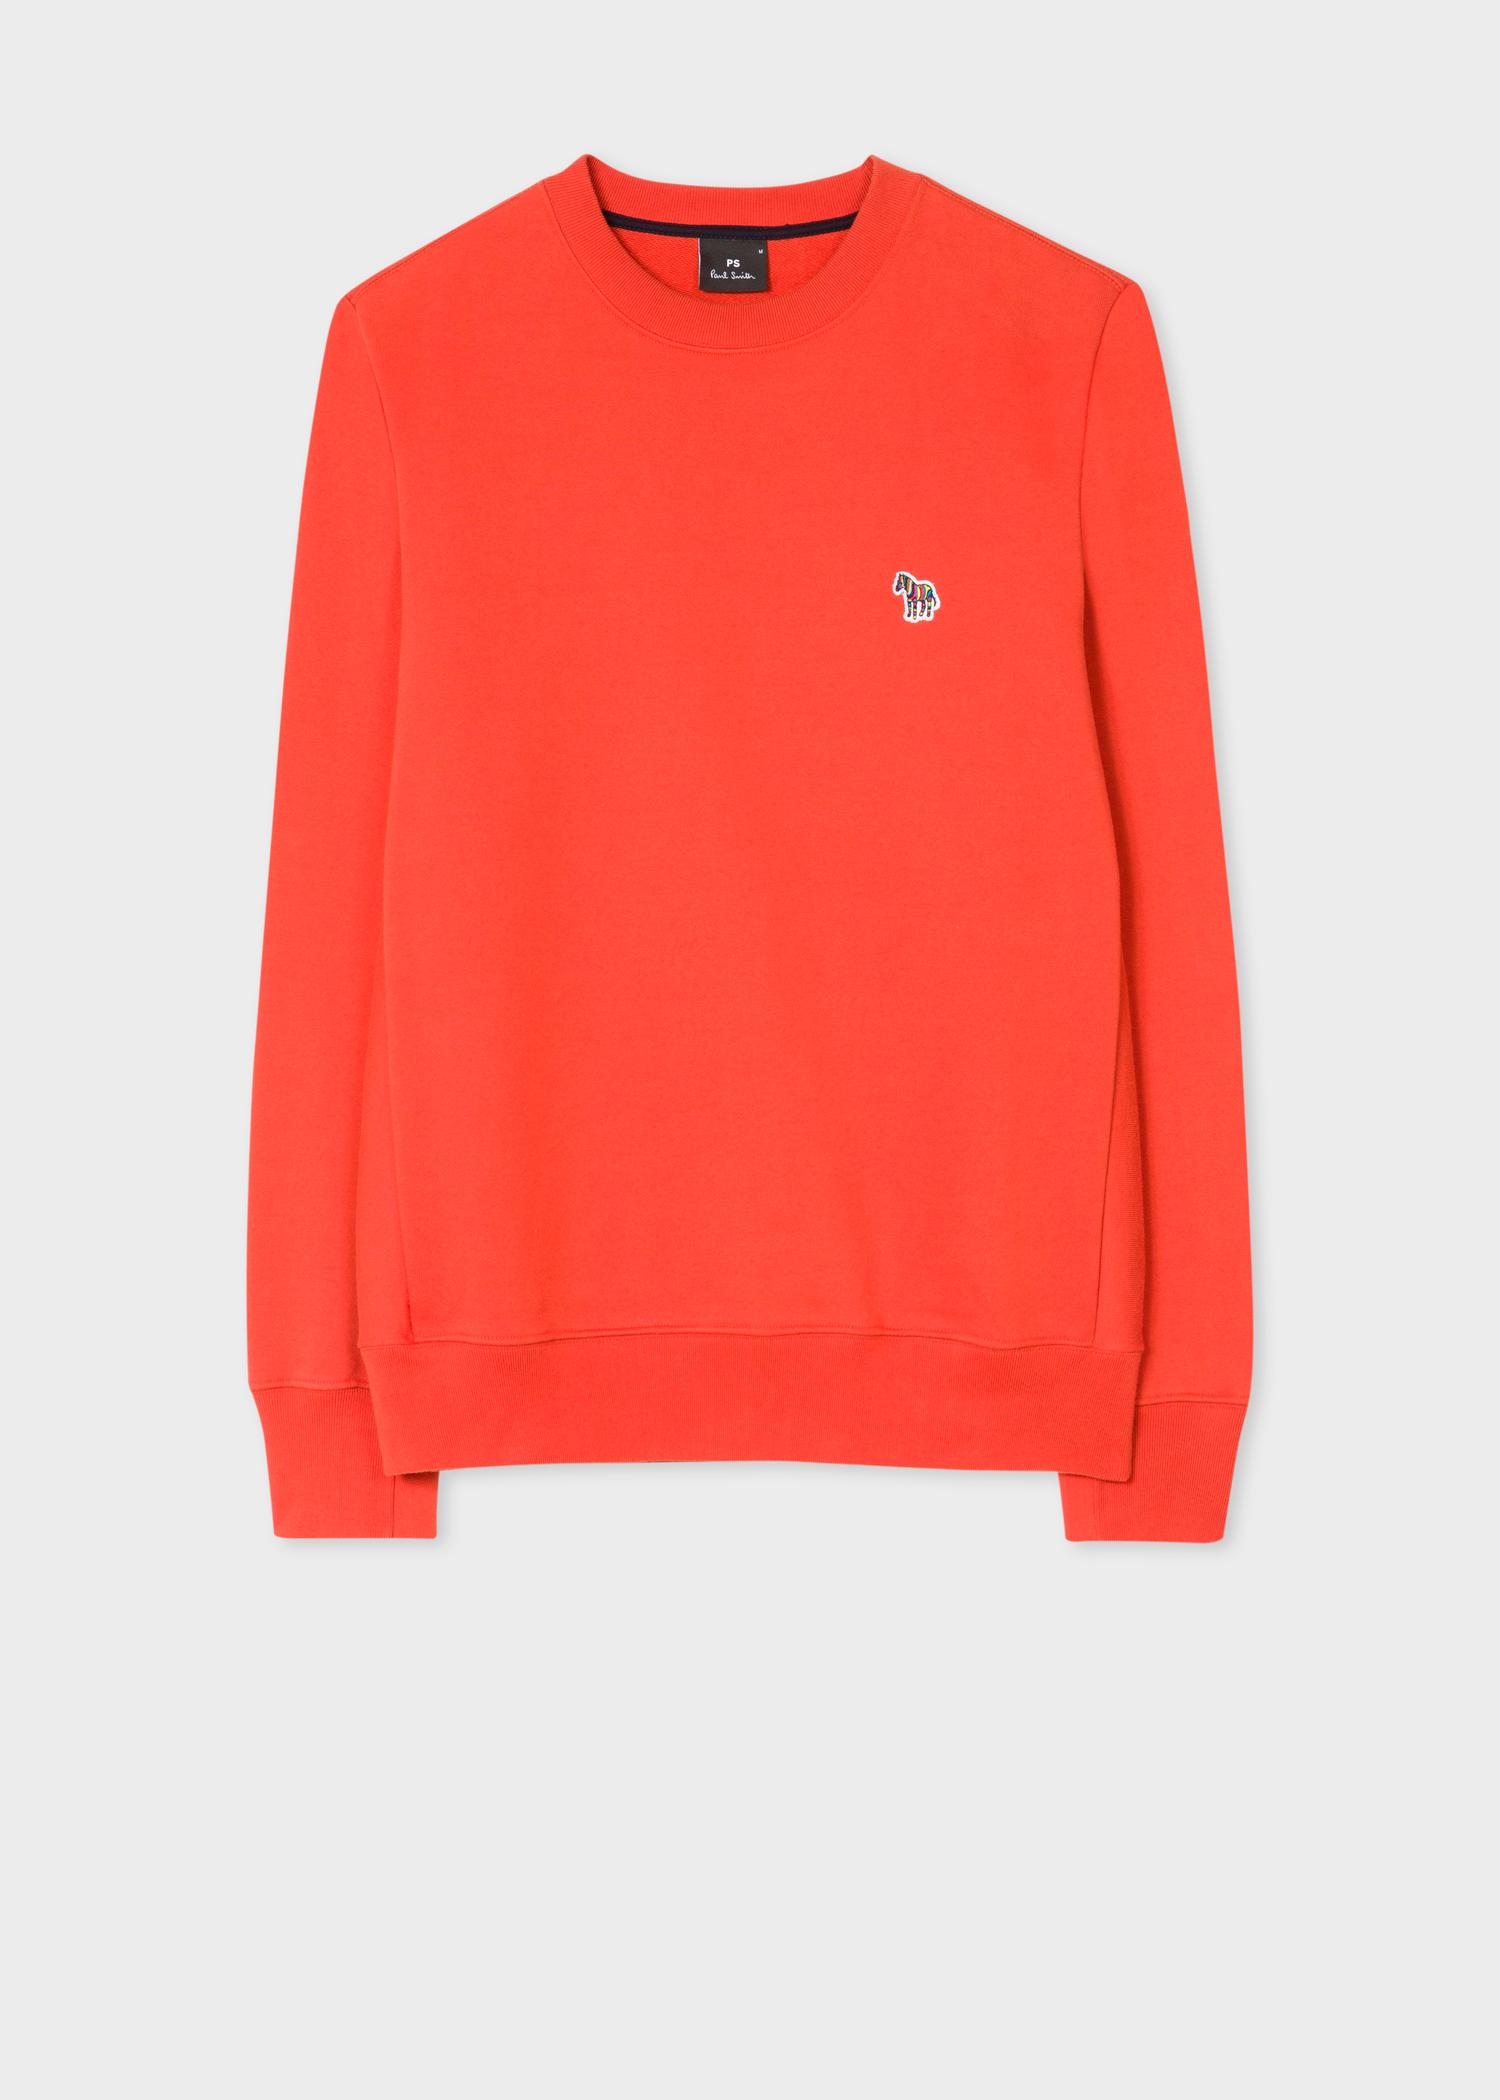 36e102d499f Vue de face - Sweatshirt Homme Orange Logo Zèbre En Coton Bio Paul Smith